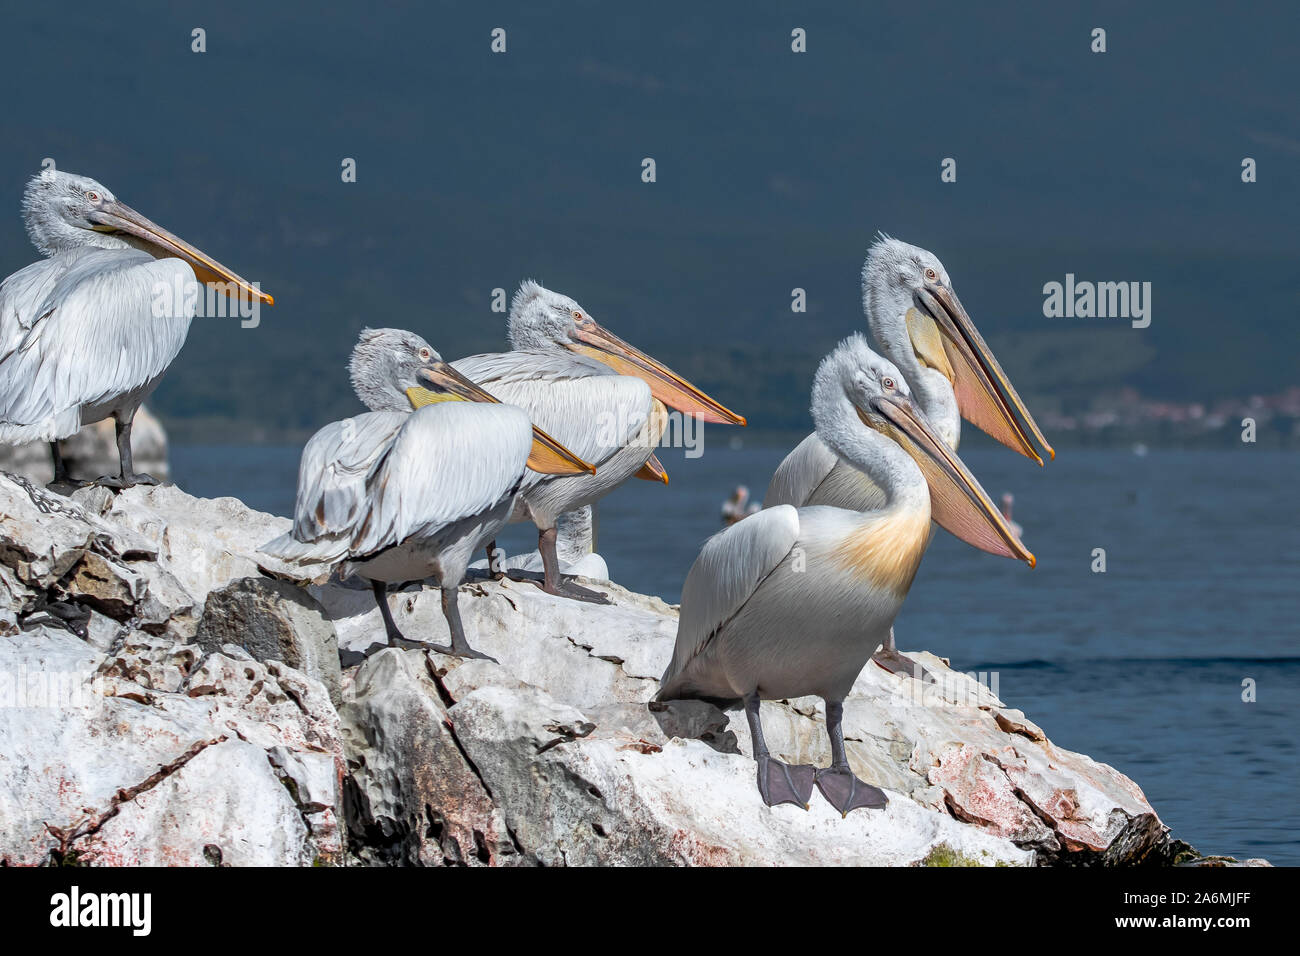 Dalmatian pelican - Pelecanus crispus. The most massive member of the pelican family, and perhaps the world's largest freshwater bird. Stock Photo